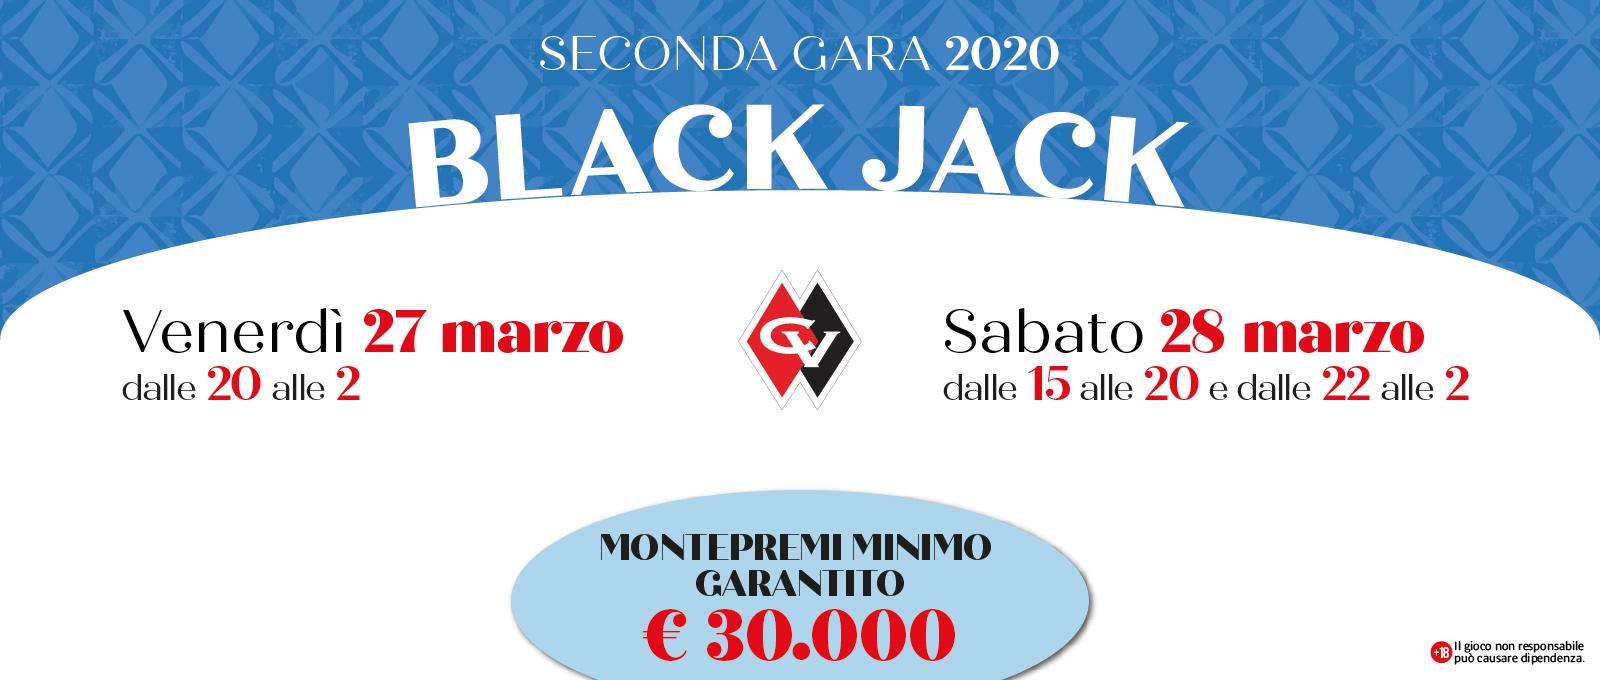 Seconda Gara di Black Jack